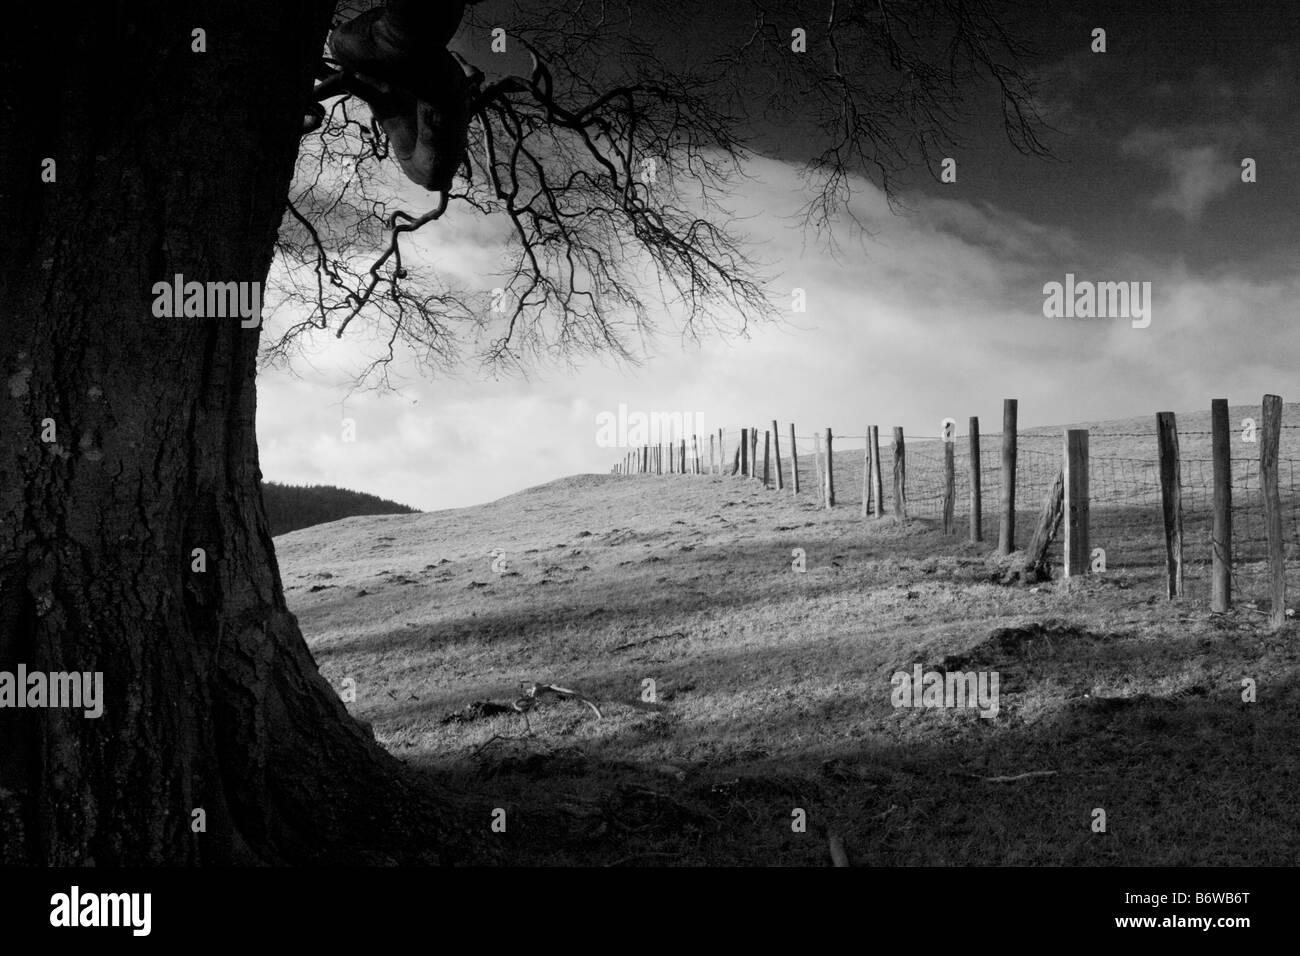 Mature beech tree in evening light Linley hill, Shropshire, England, UK - Stock Image